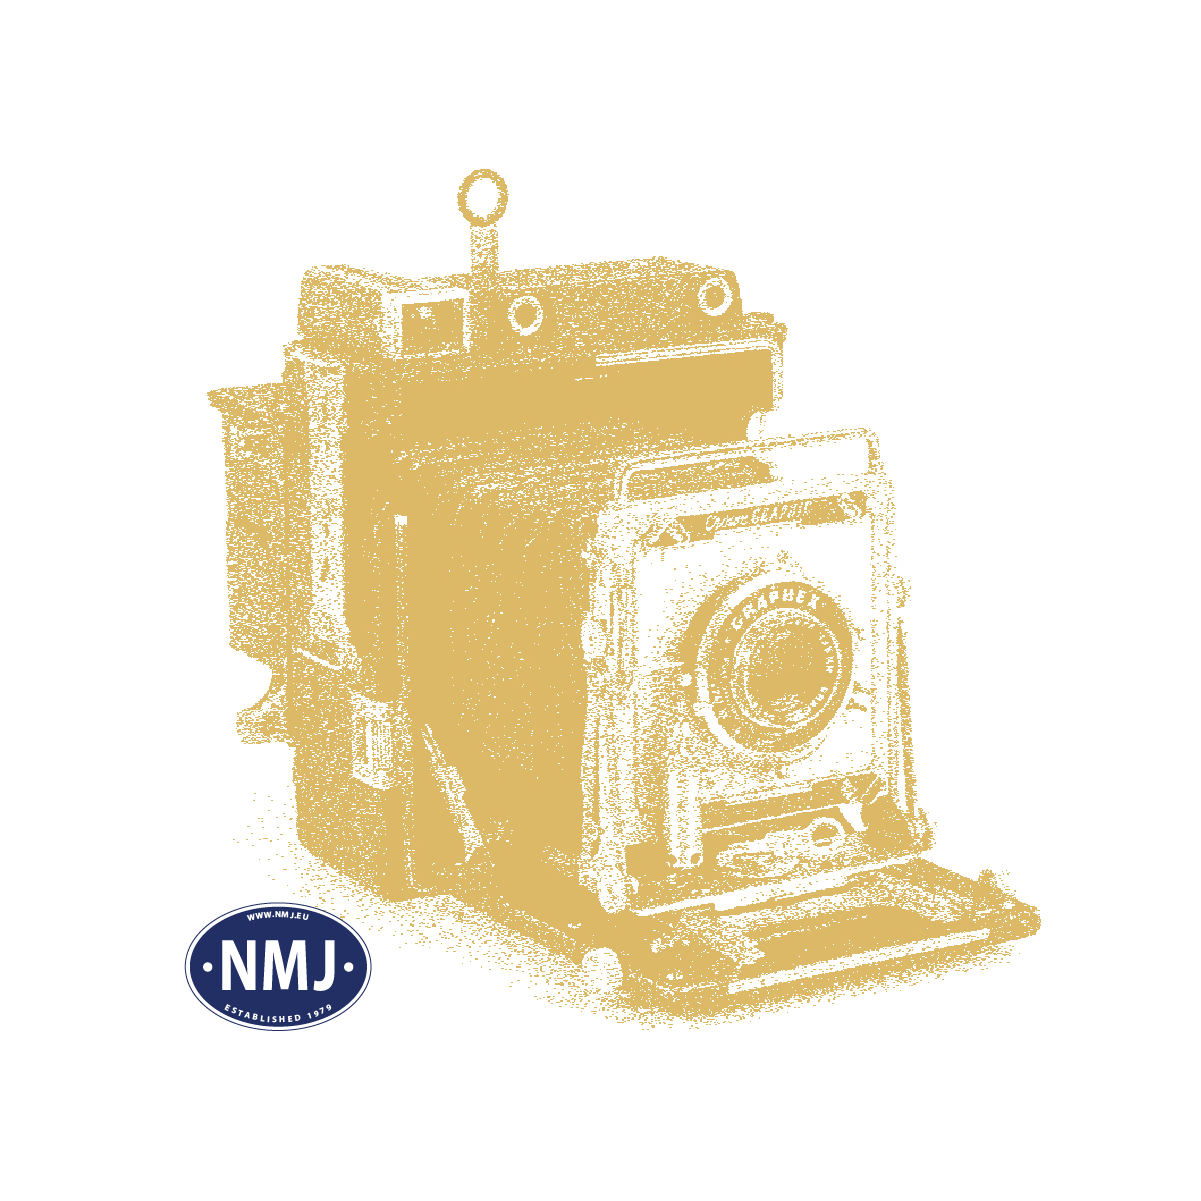 NMJT105.101 - NMJ Topline NSB A2 24003 Gammeldesign